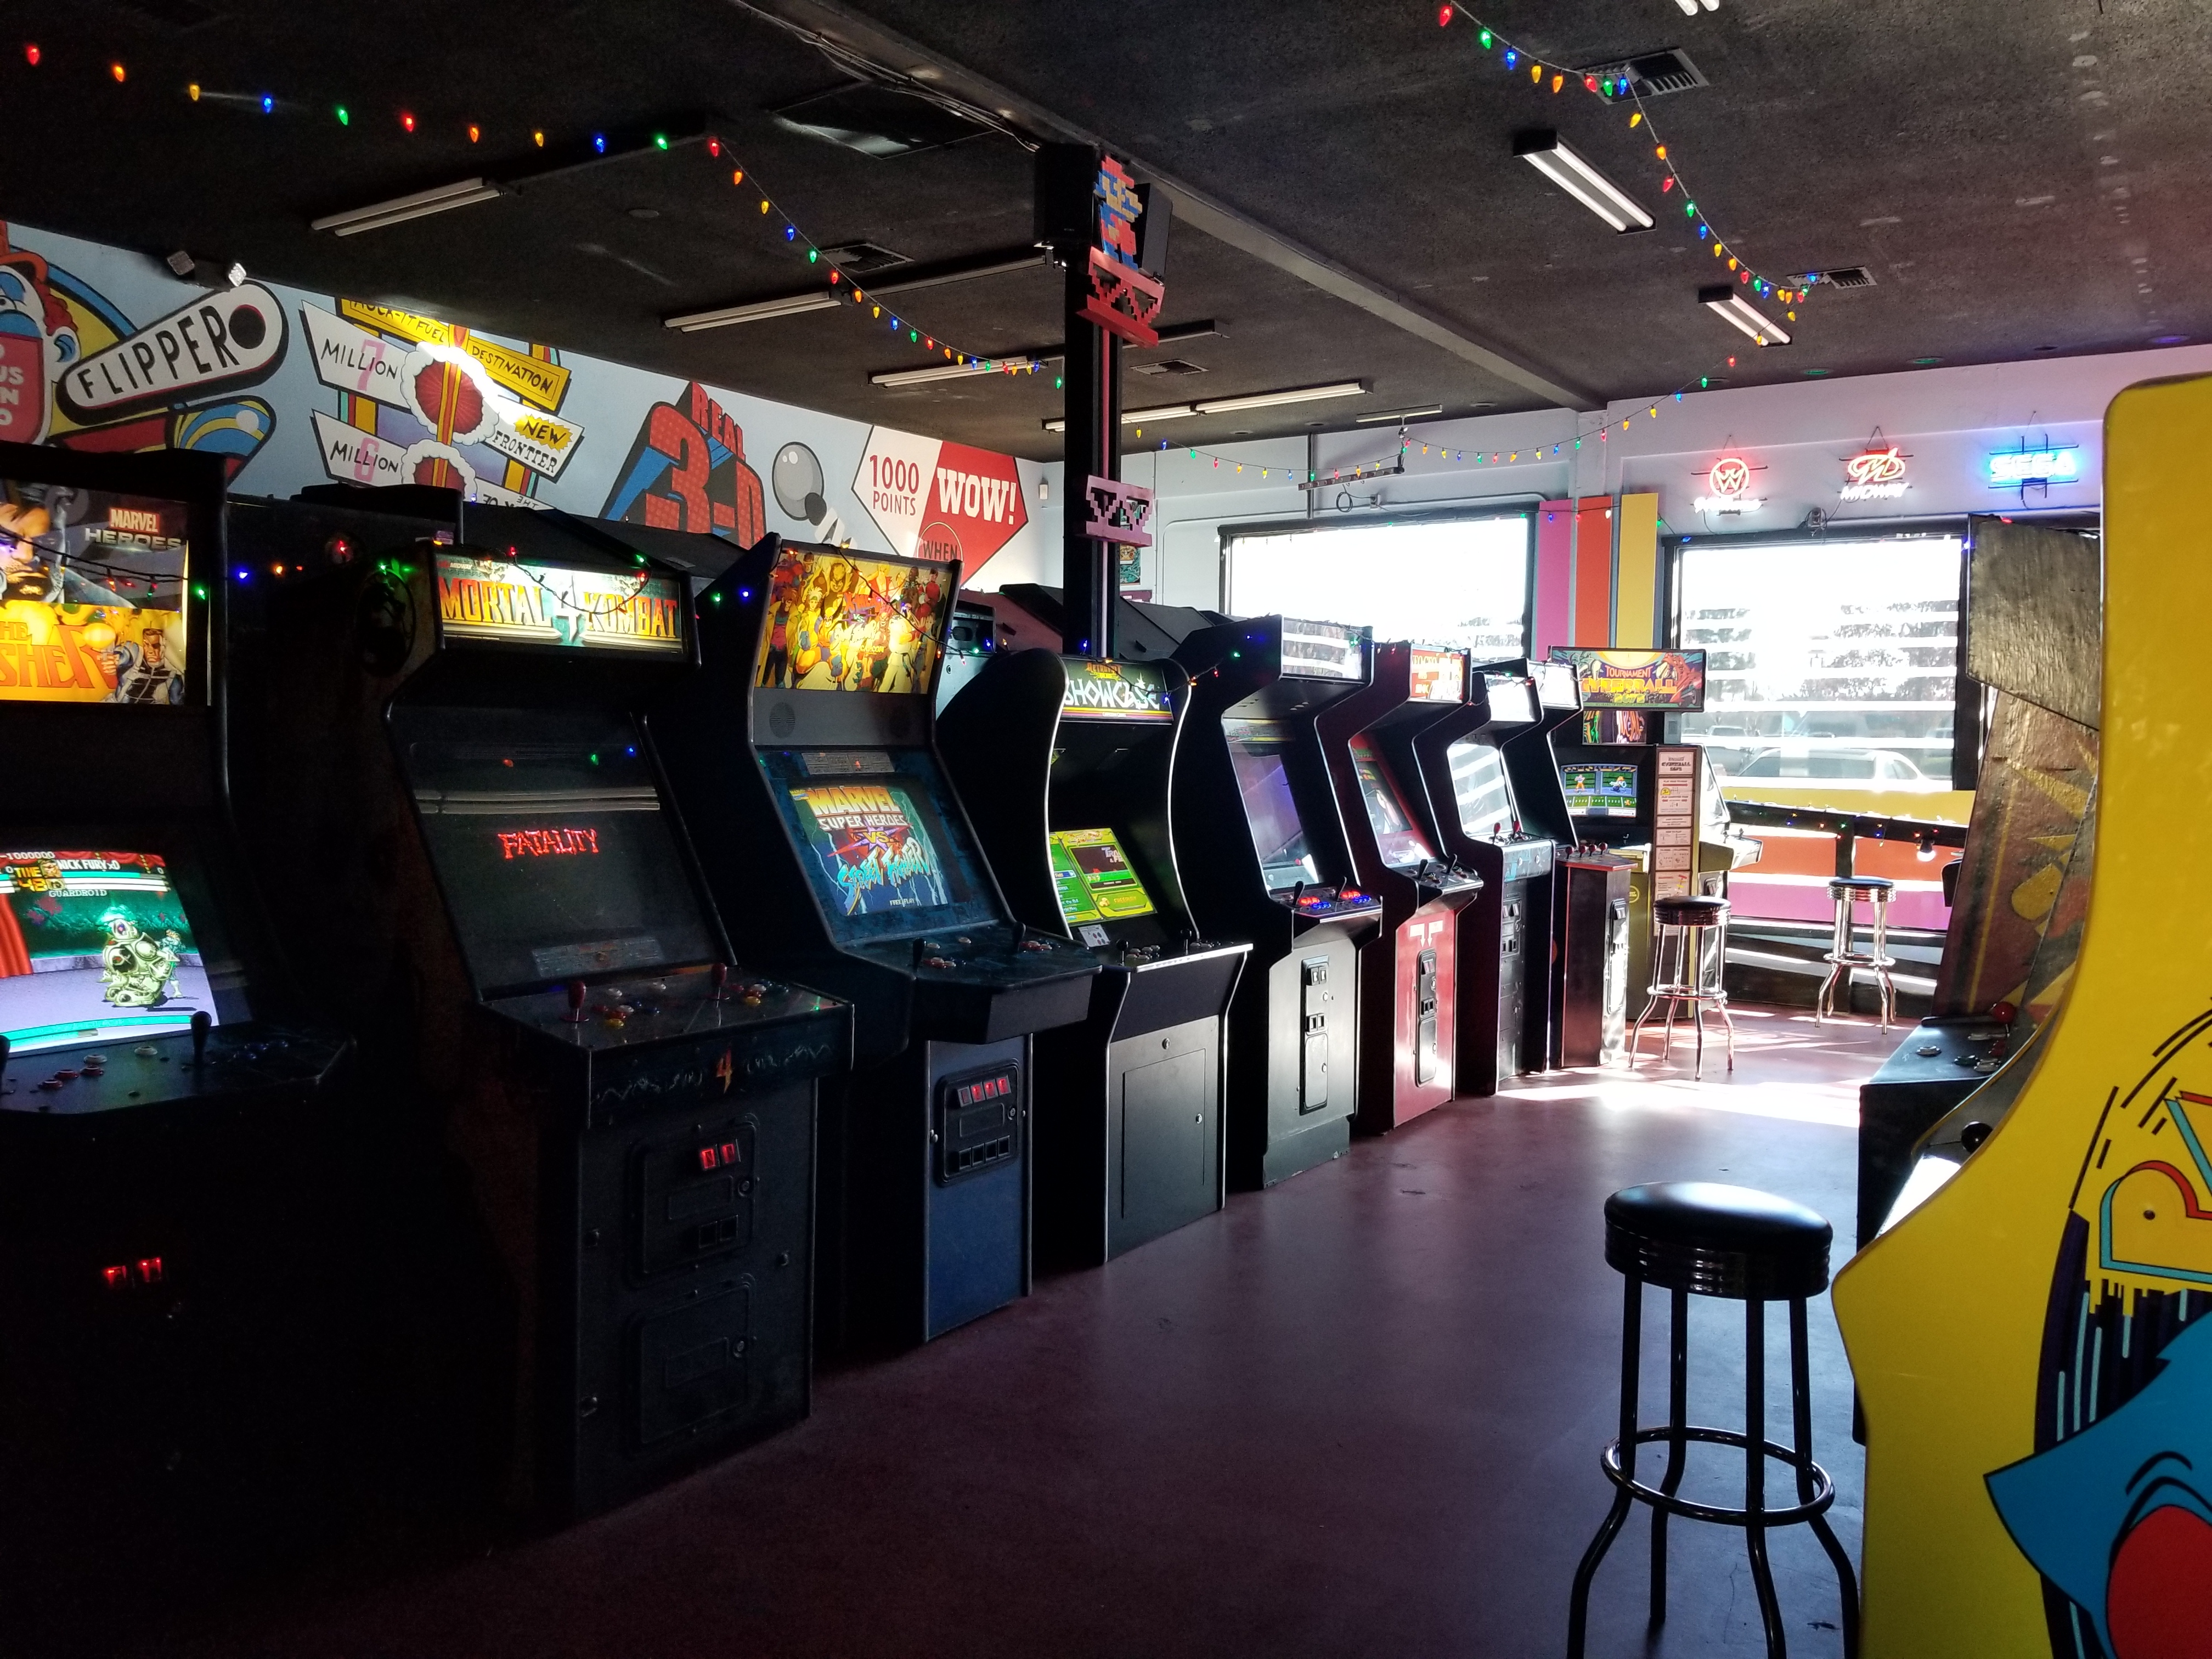 File:Retrovolt Arcade 2017 - Arcade Machines 1.jpg - Wikipedia